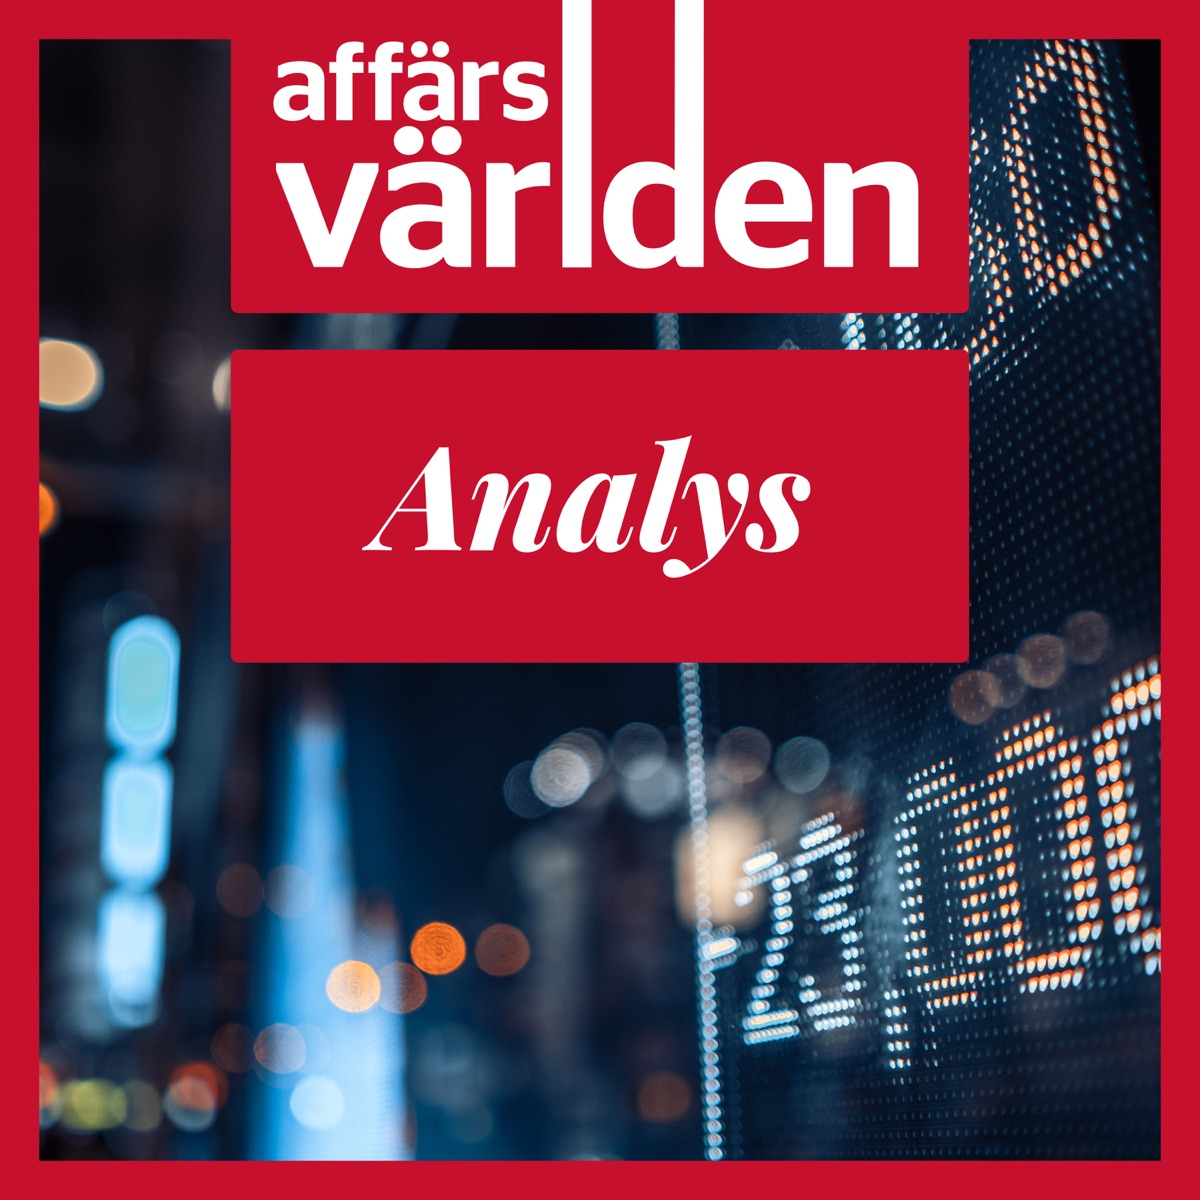 Affärsvärlden Analys